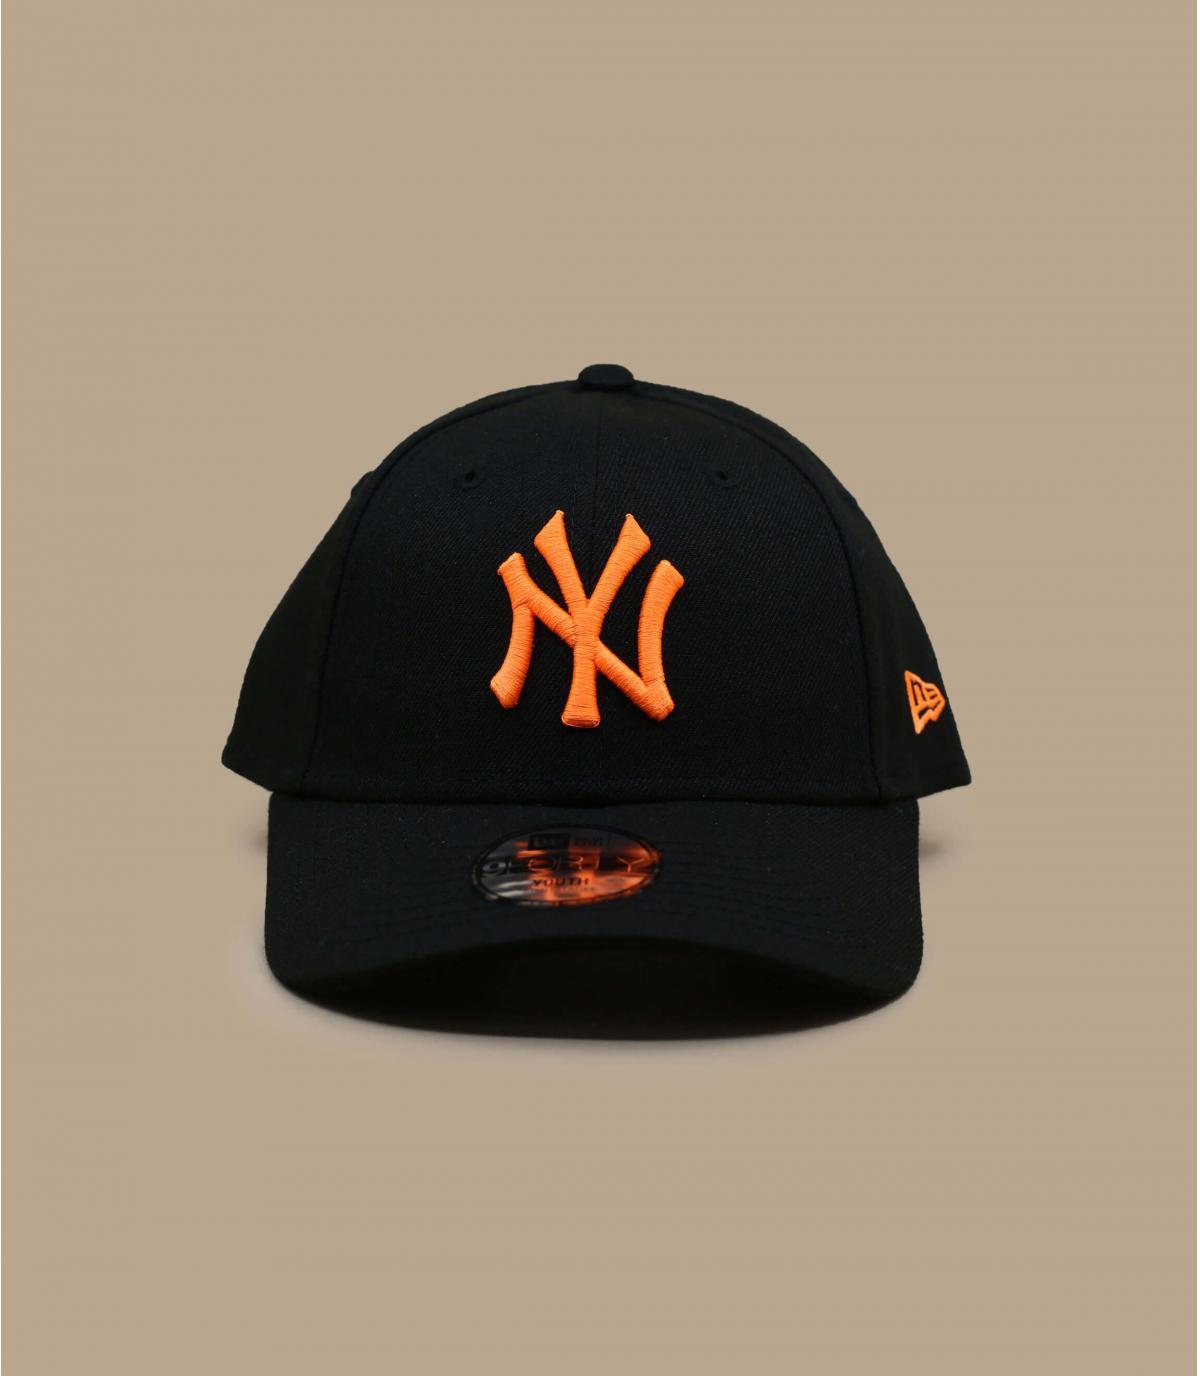 NY child cap black orange